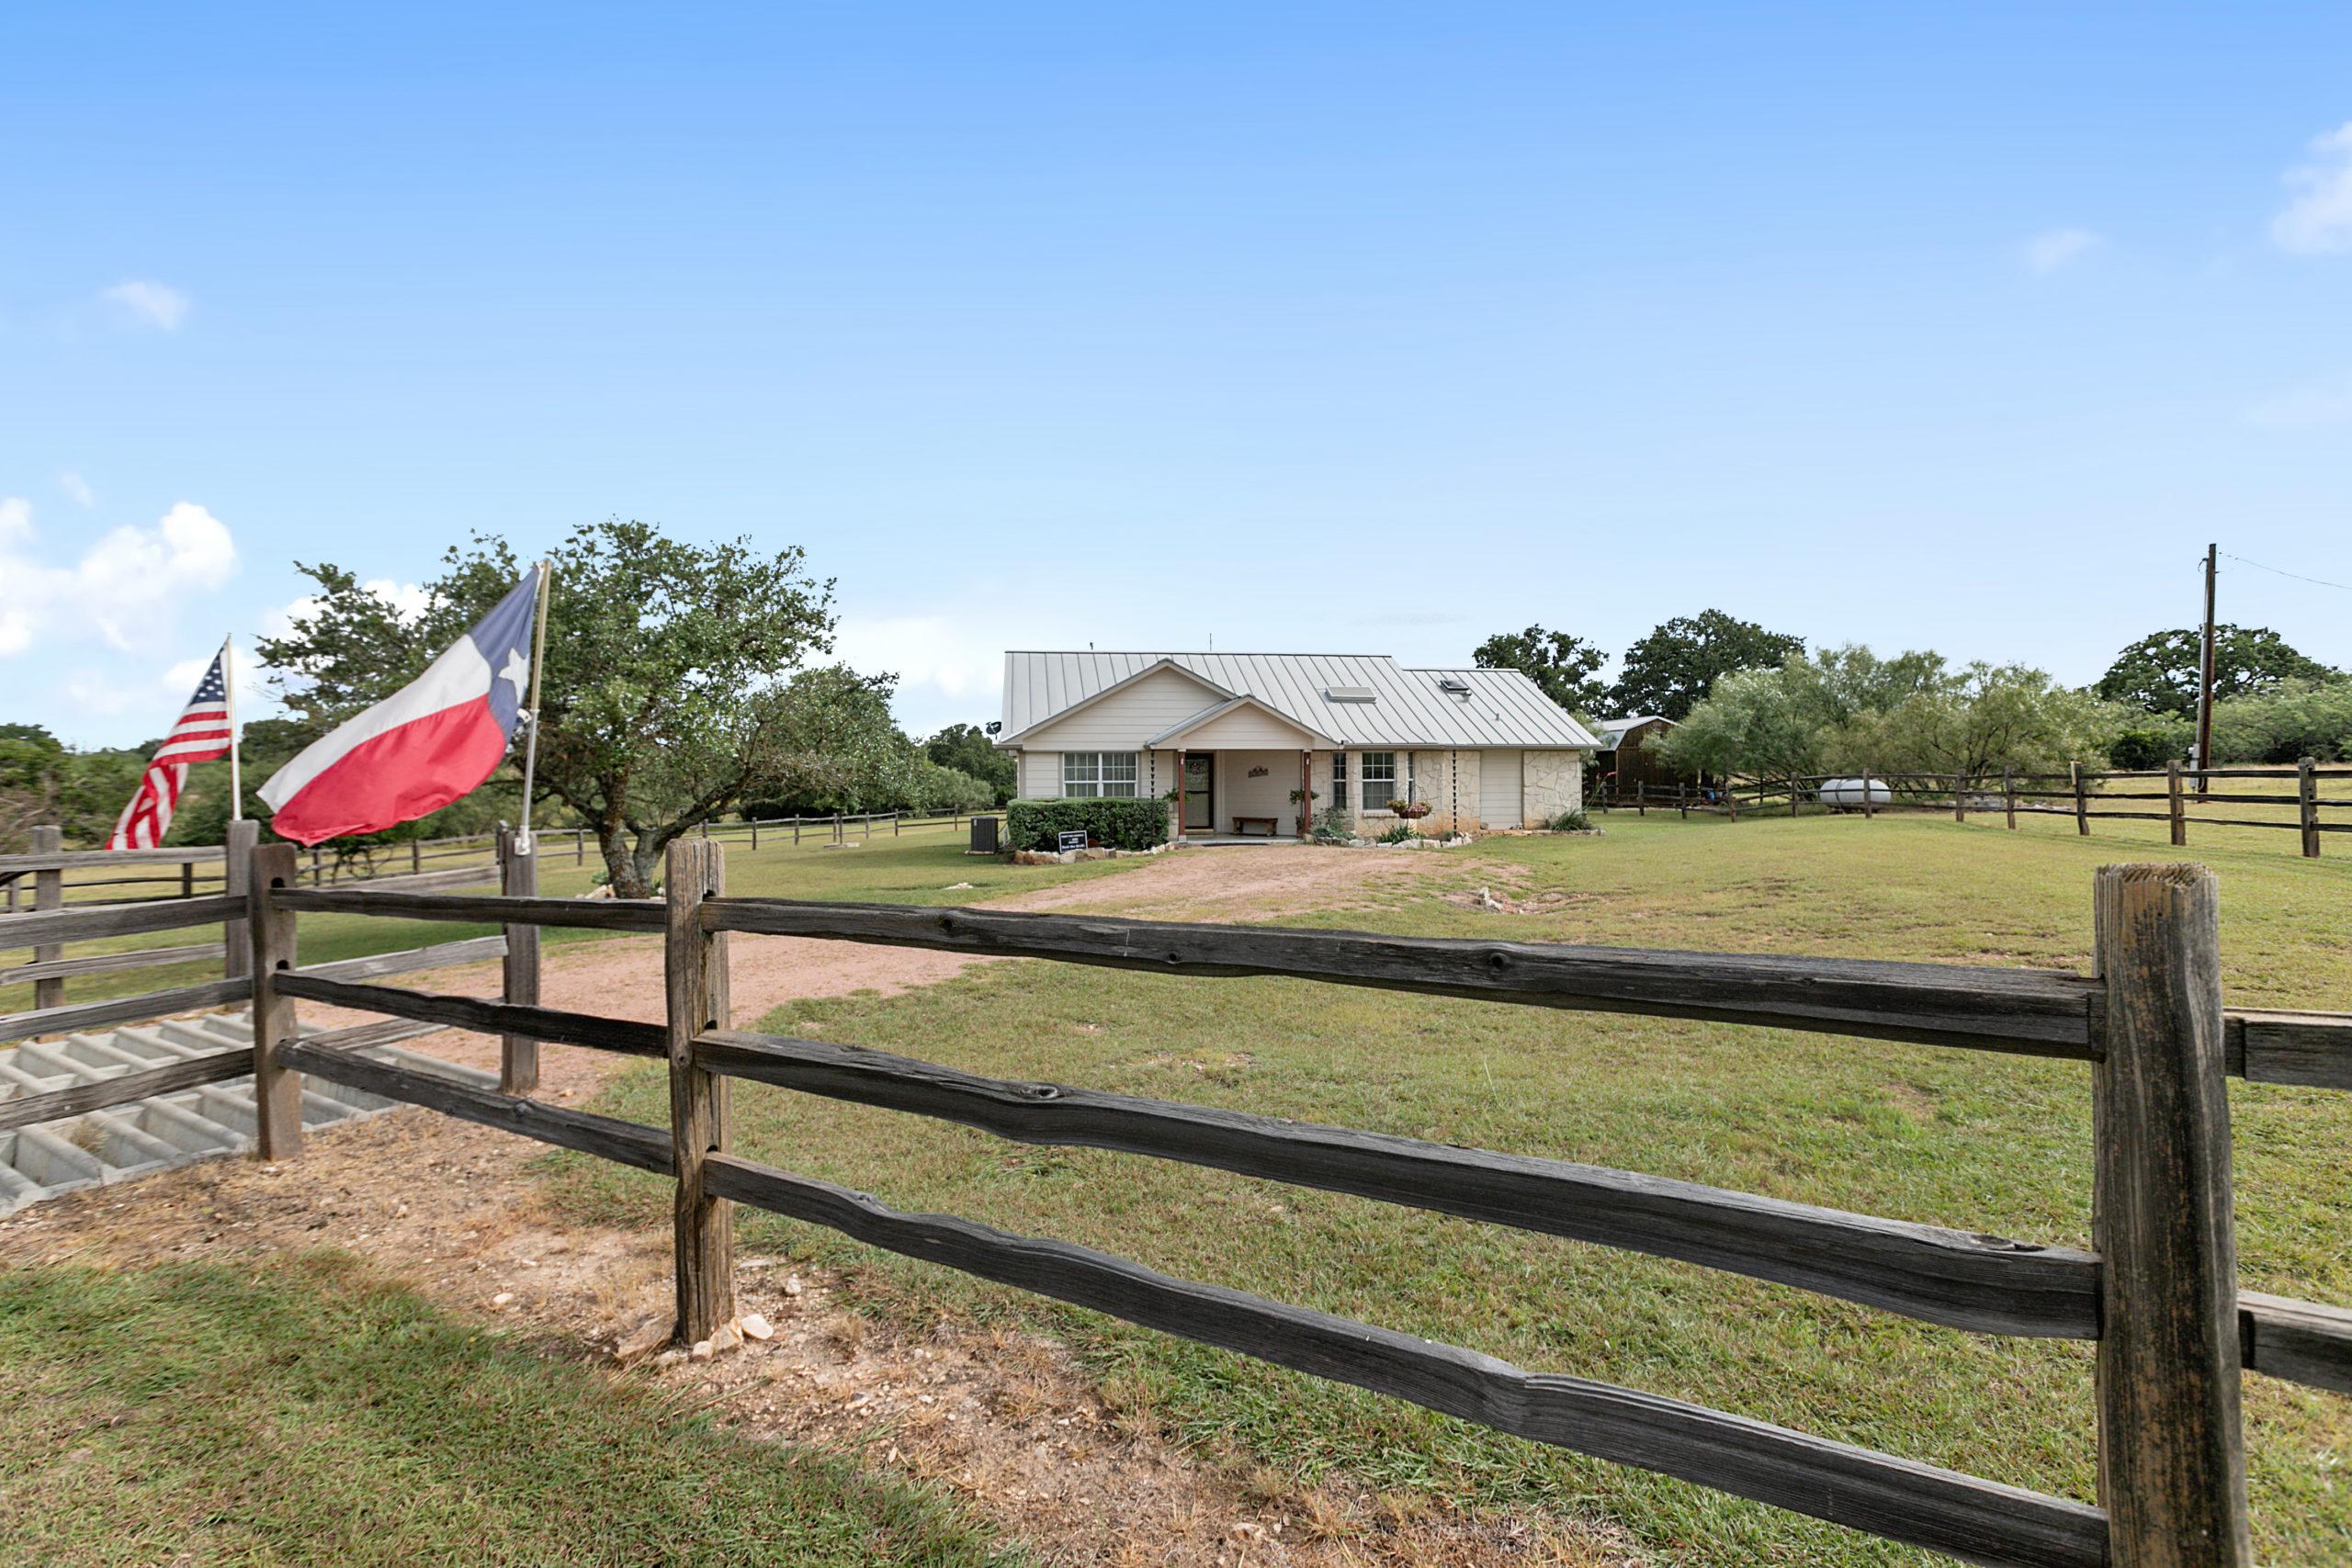 720 Funf Kinder Fredericksburg TX home on acreage for sale